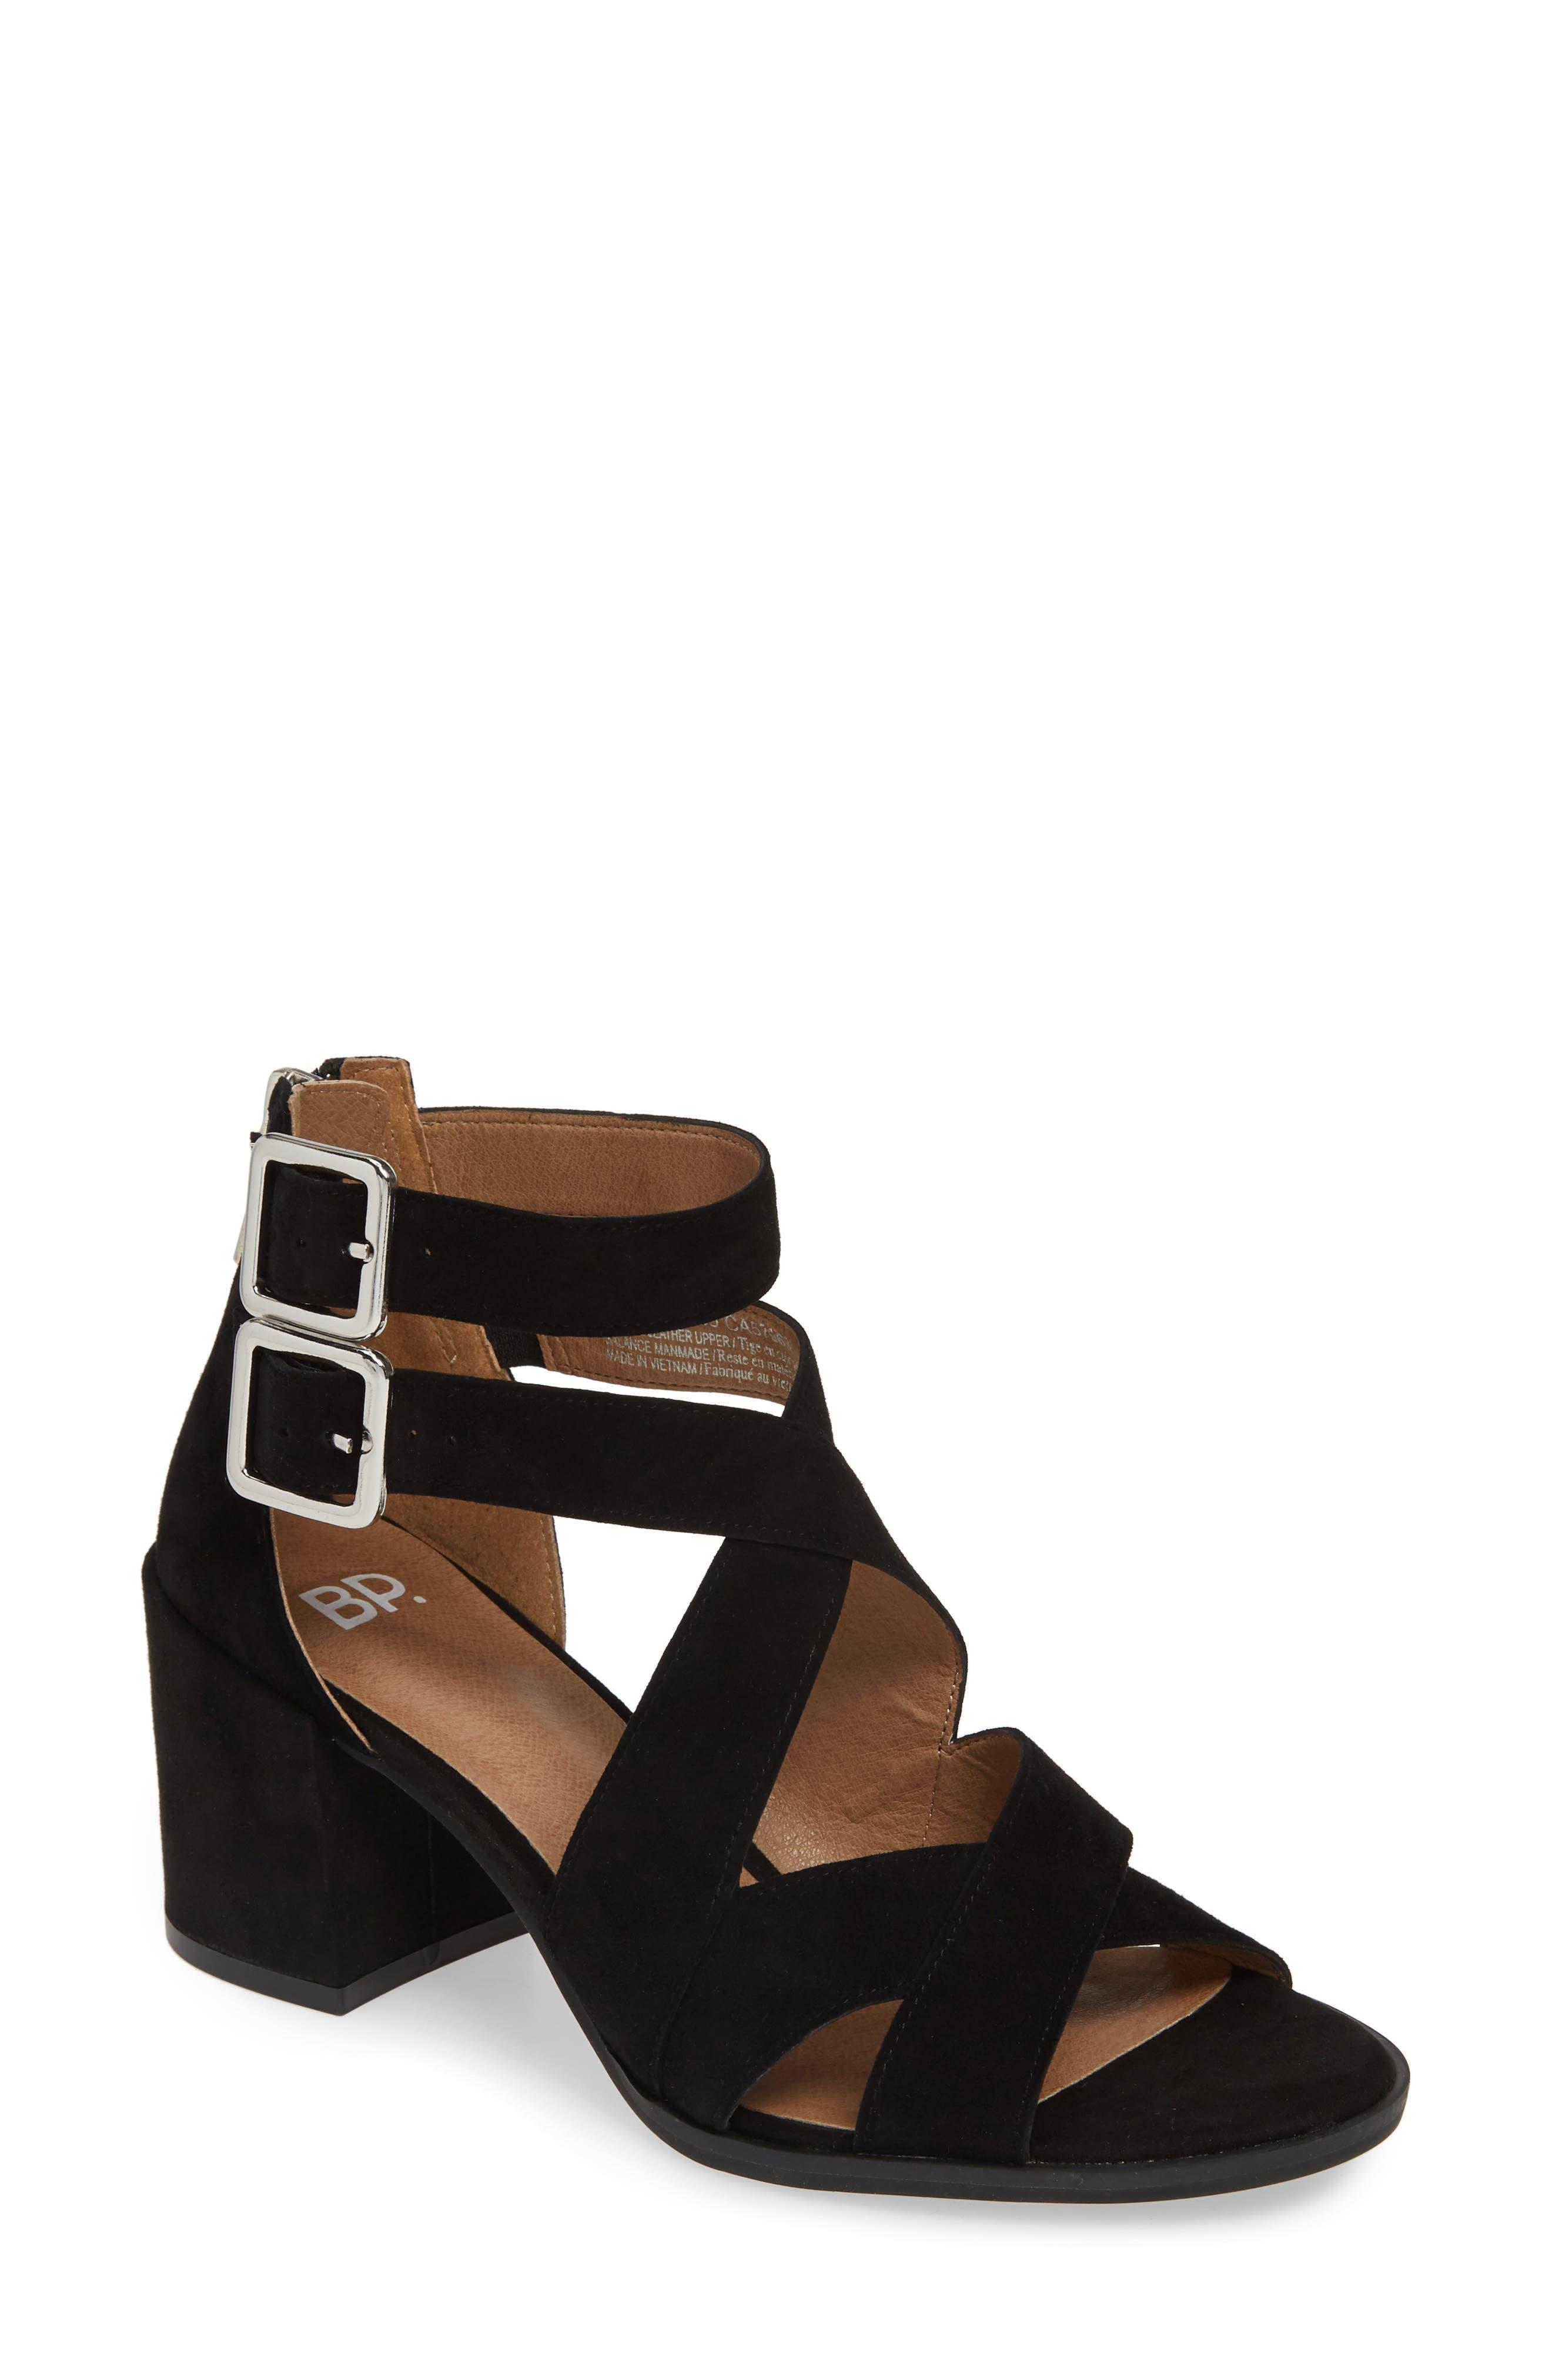 Izzy Block Heel Sandal, Main, color, BLACK SUEDE